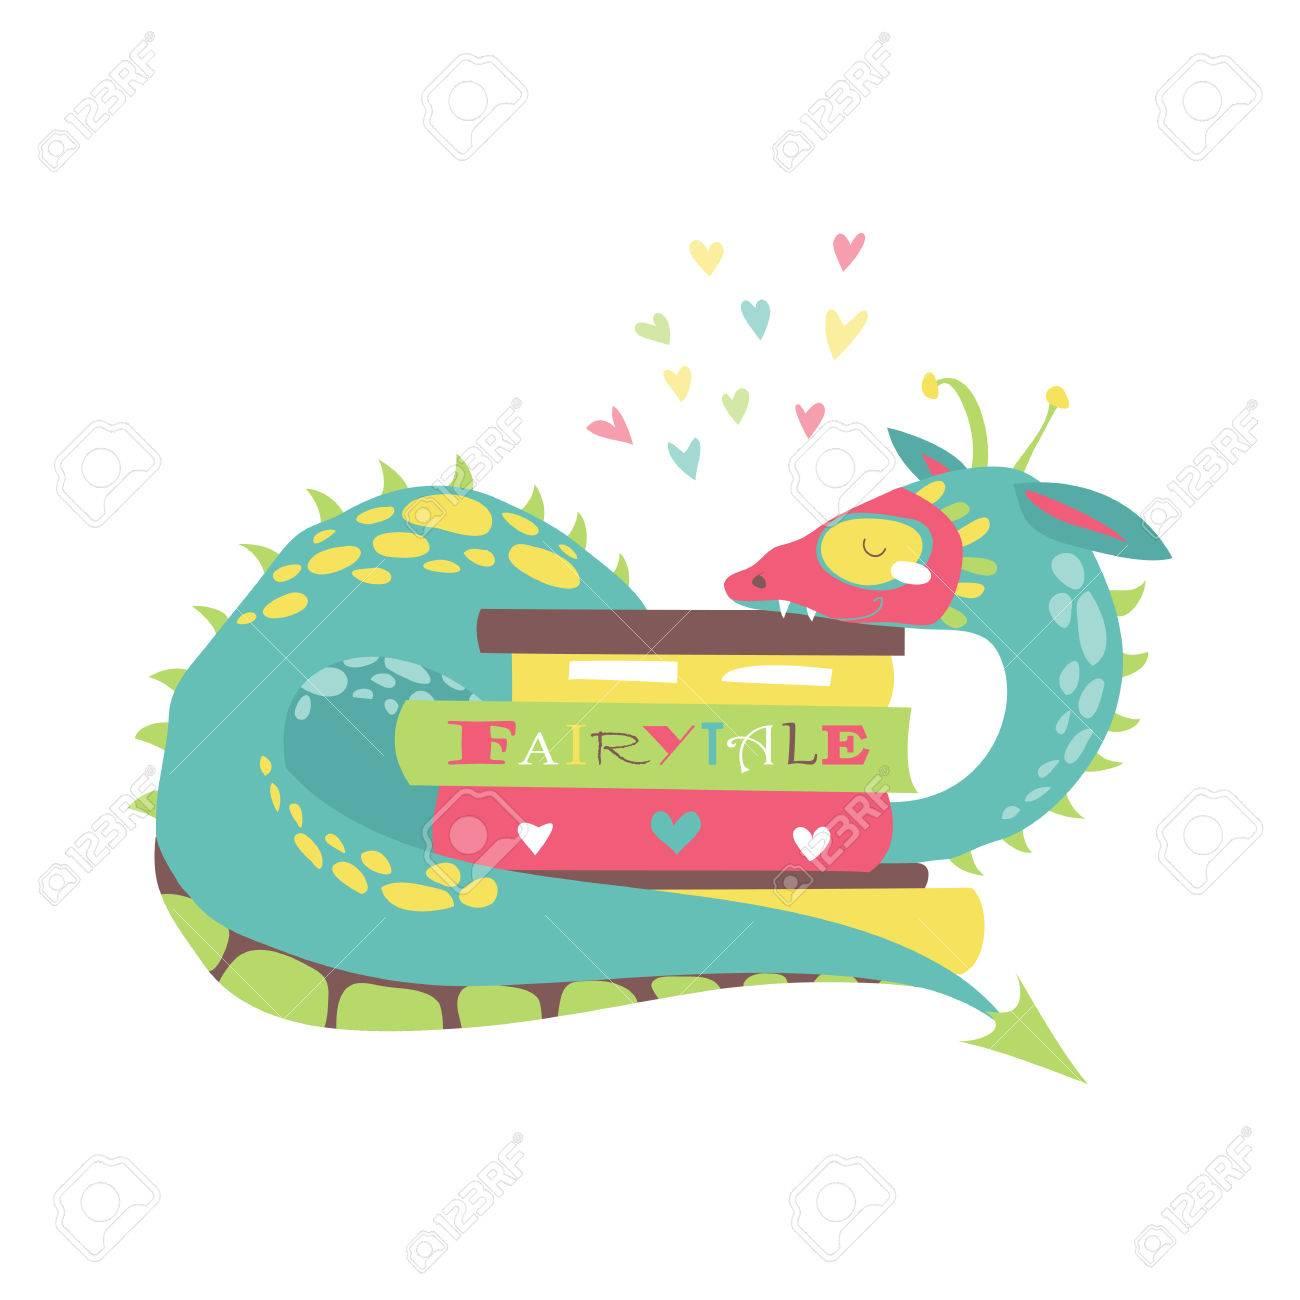 Cute Drachen Mit Stapel Bücher. Vektor-Illustration Lizenzfrei ...